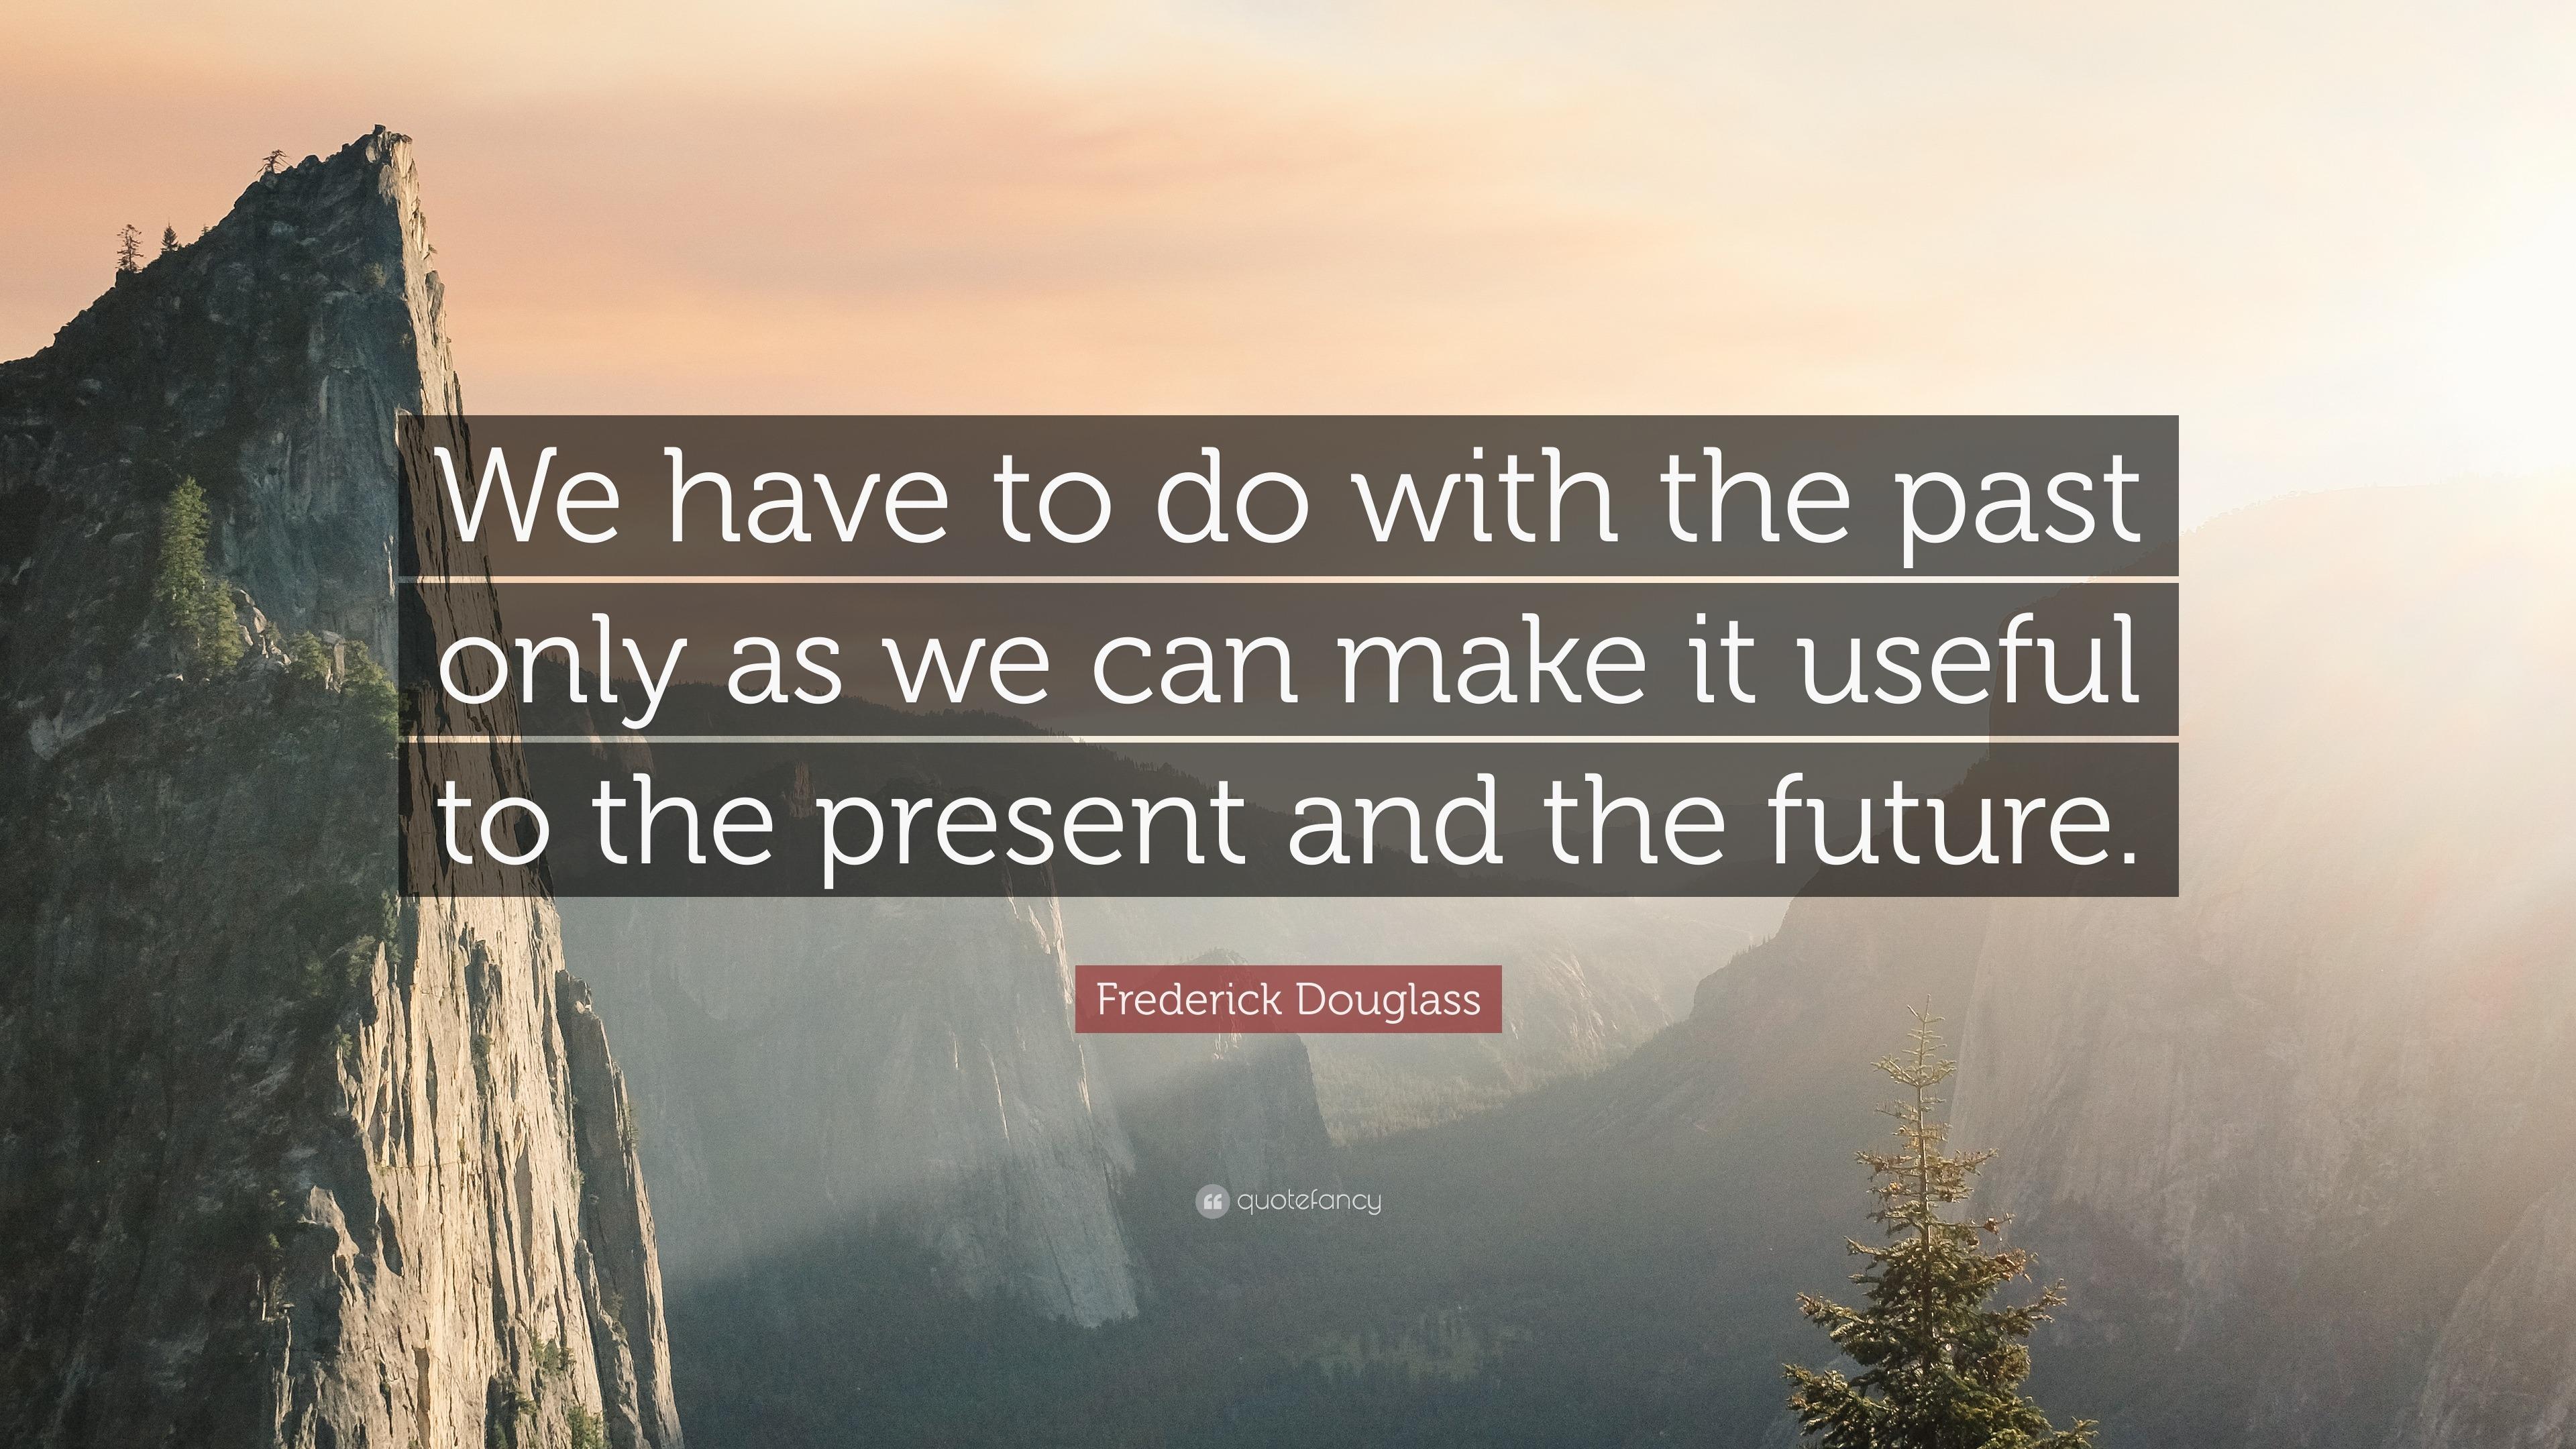 Frederick Douglass Quotes (100 wallpapers) - Quotefancy